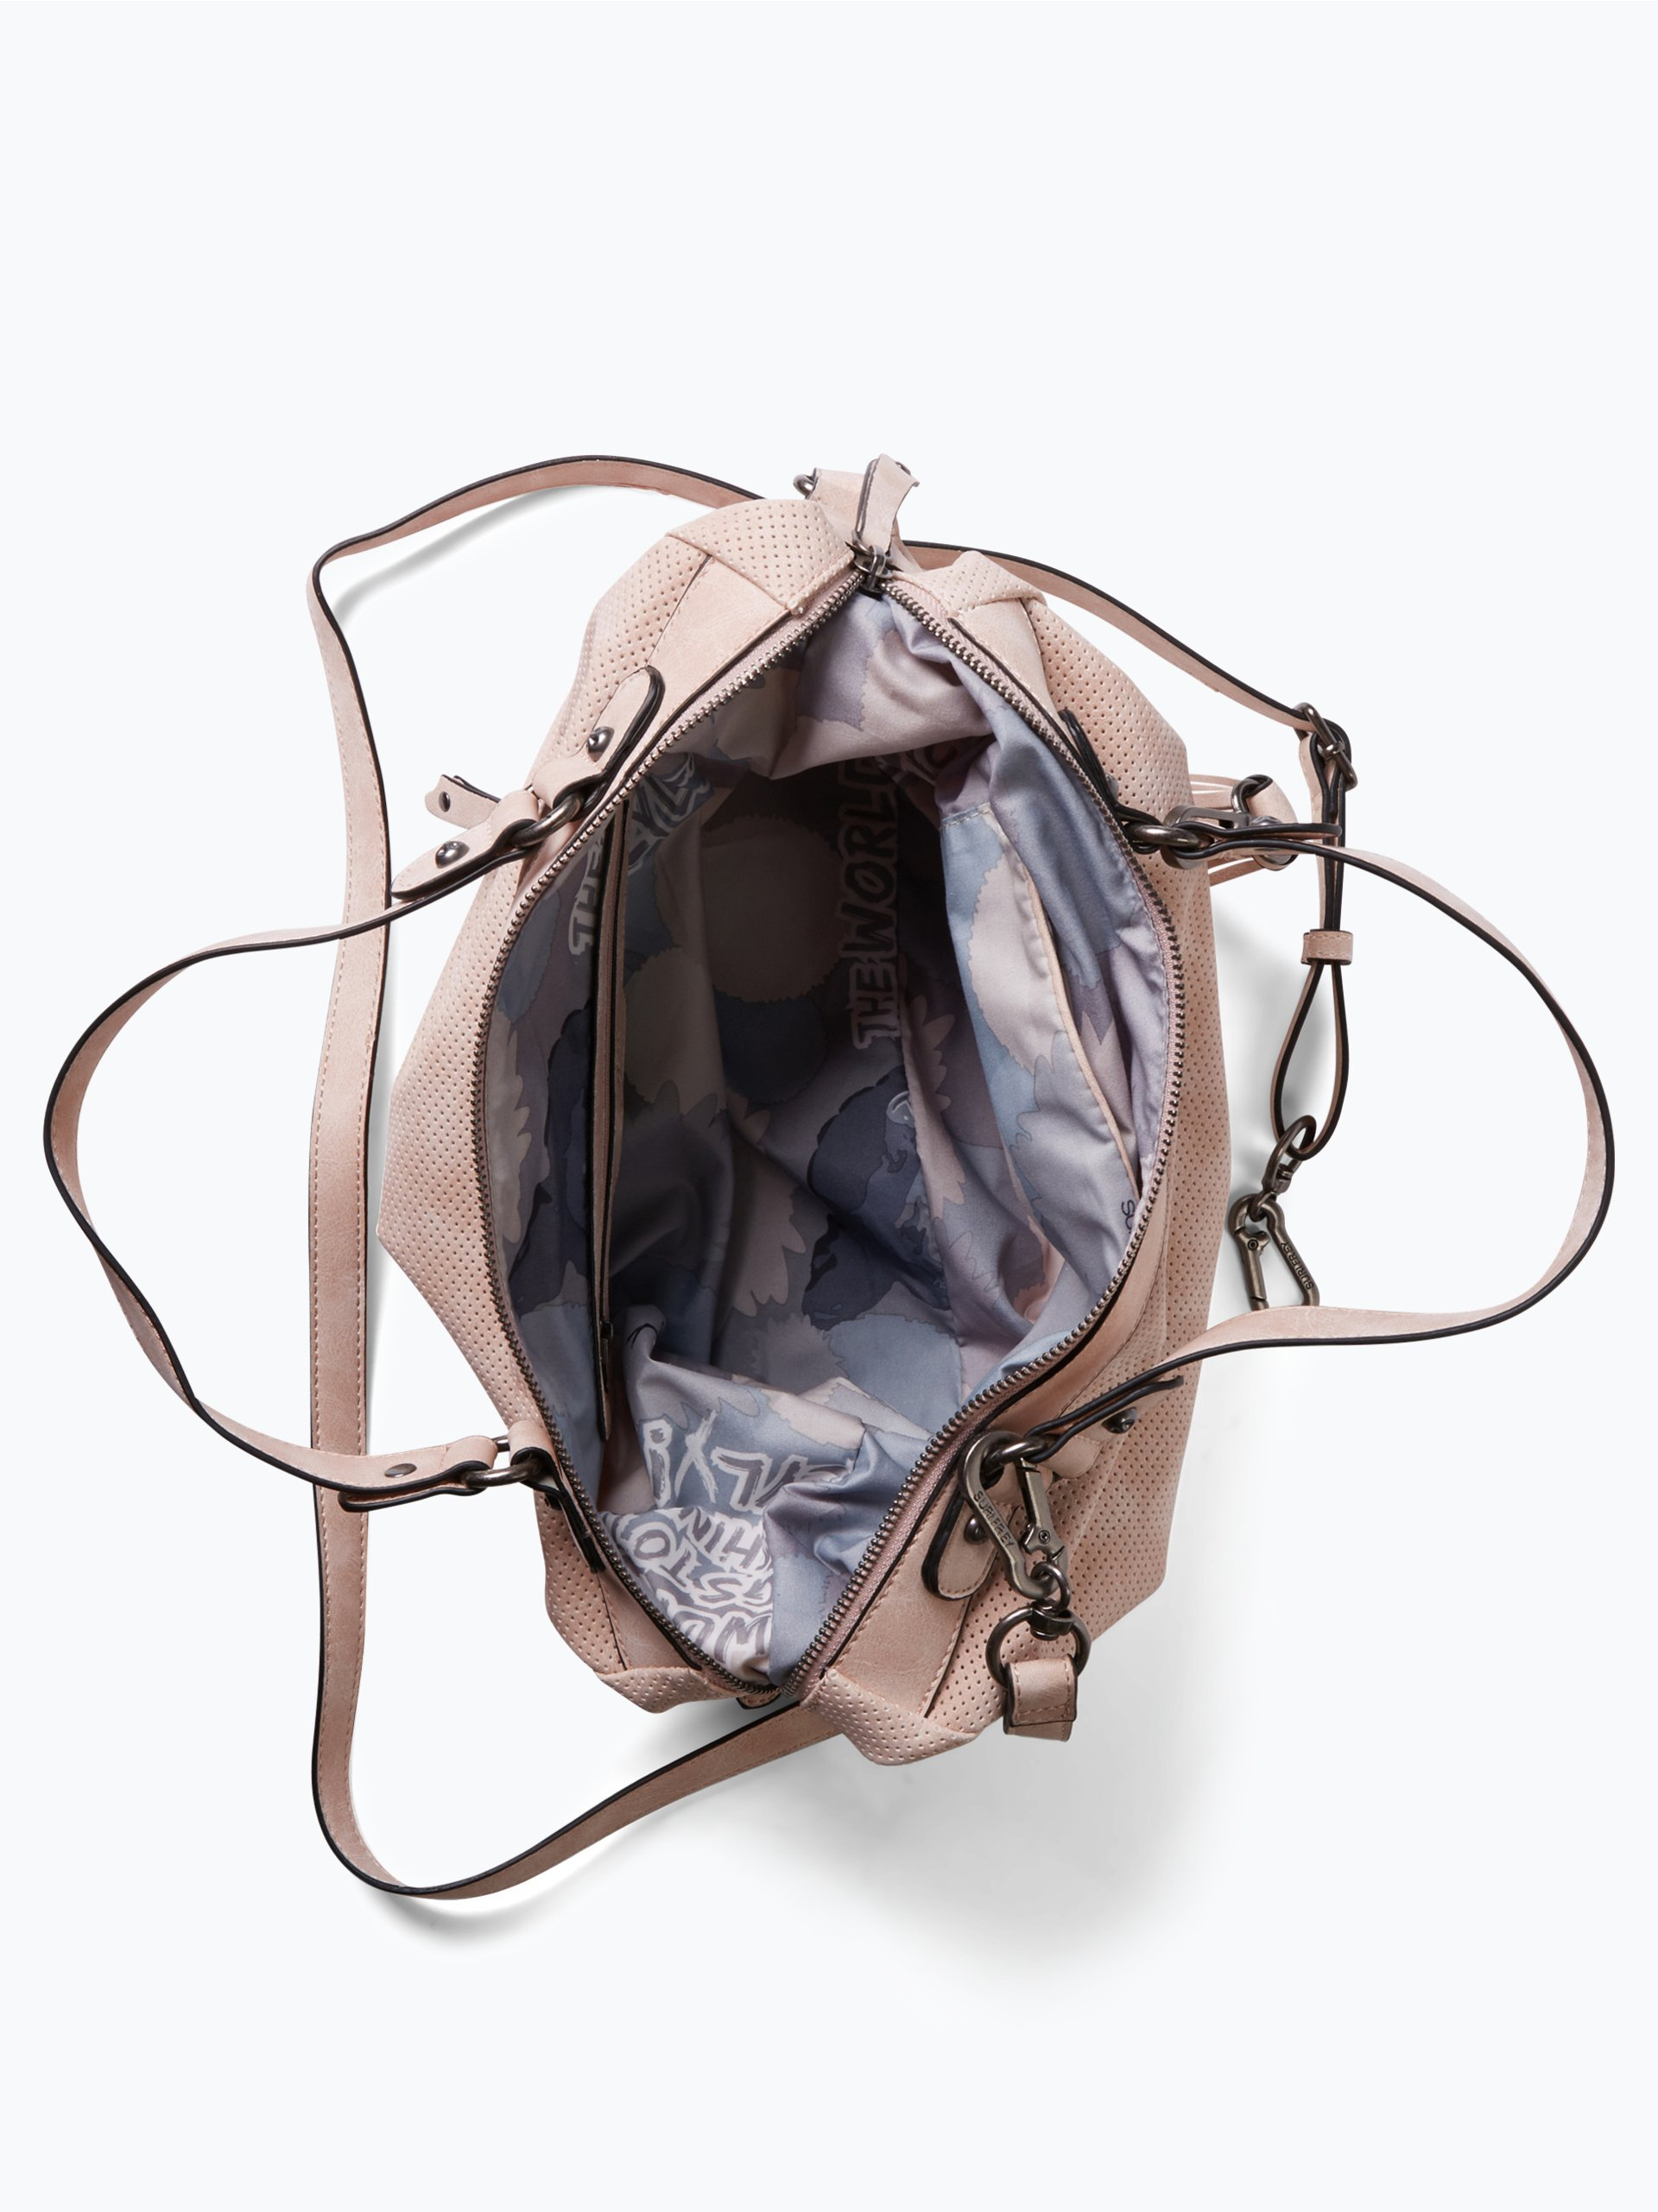 suri frey damen handtasche in leder optik romy rosa uni online kaufen peek und cloppenburg de. Black Bedroom Furniture Sets. Home Design Ideas